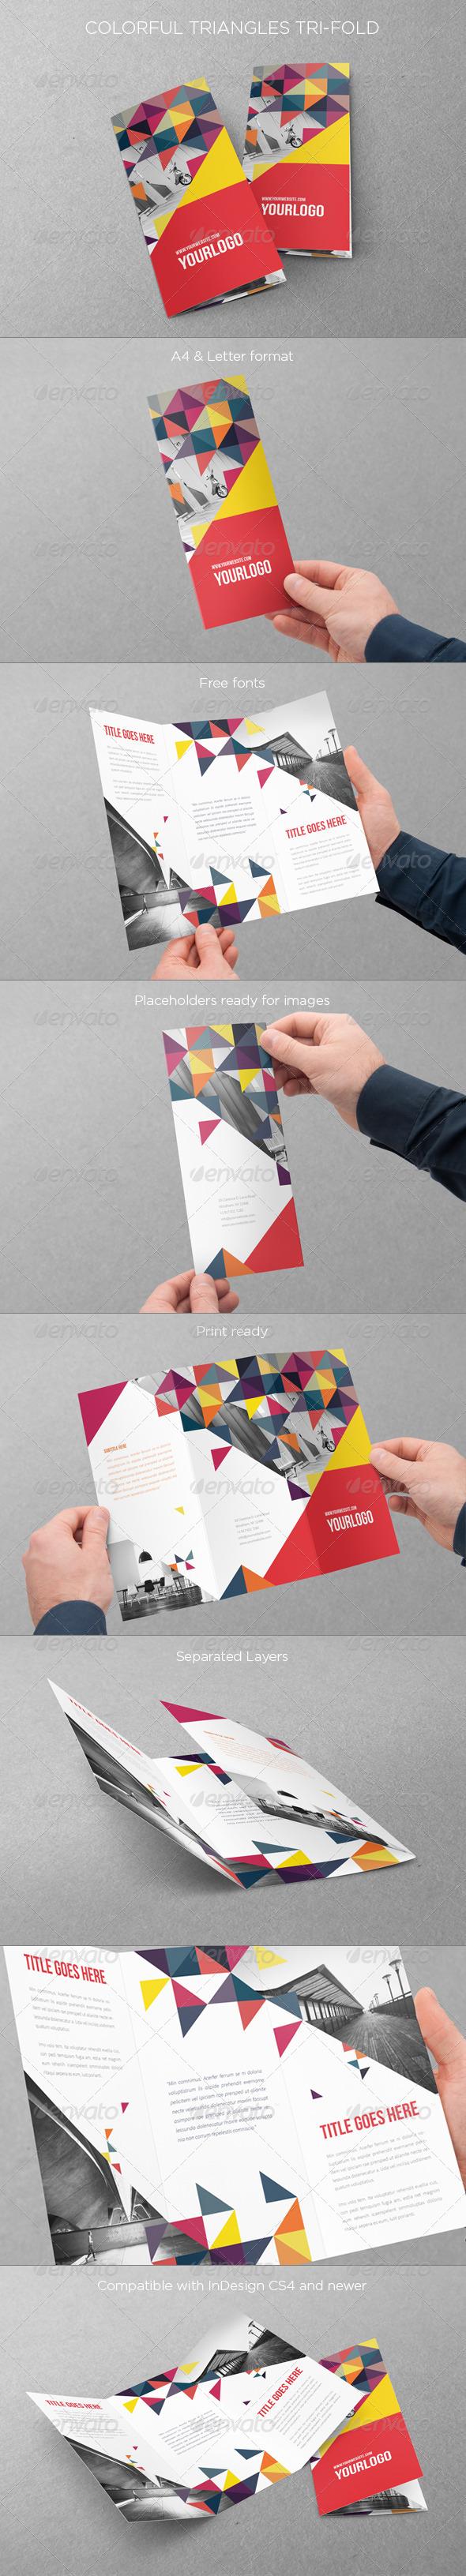 GraphicRiver Colorful Triangles Trifold 6860593